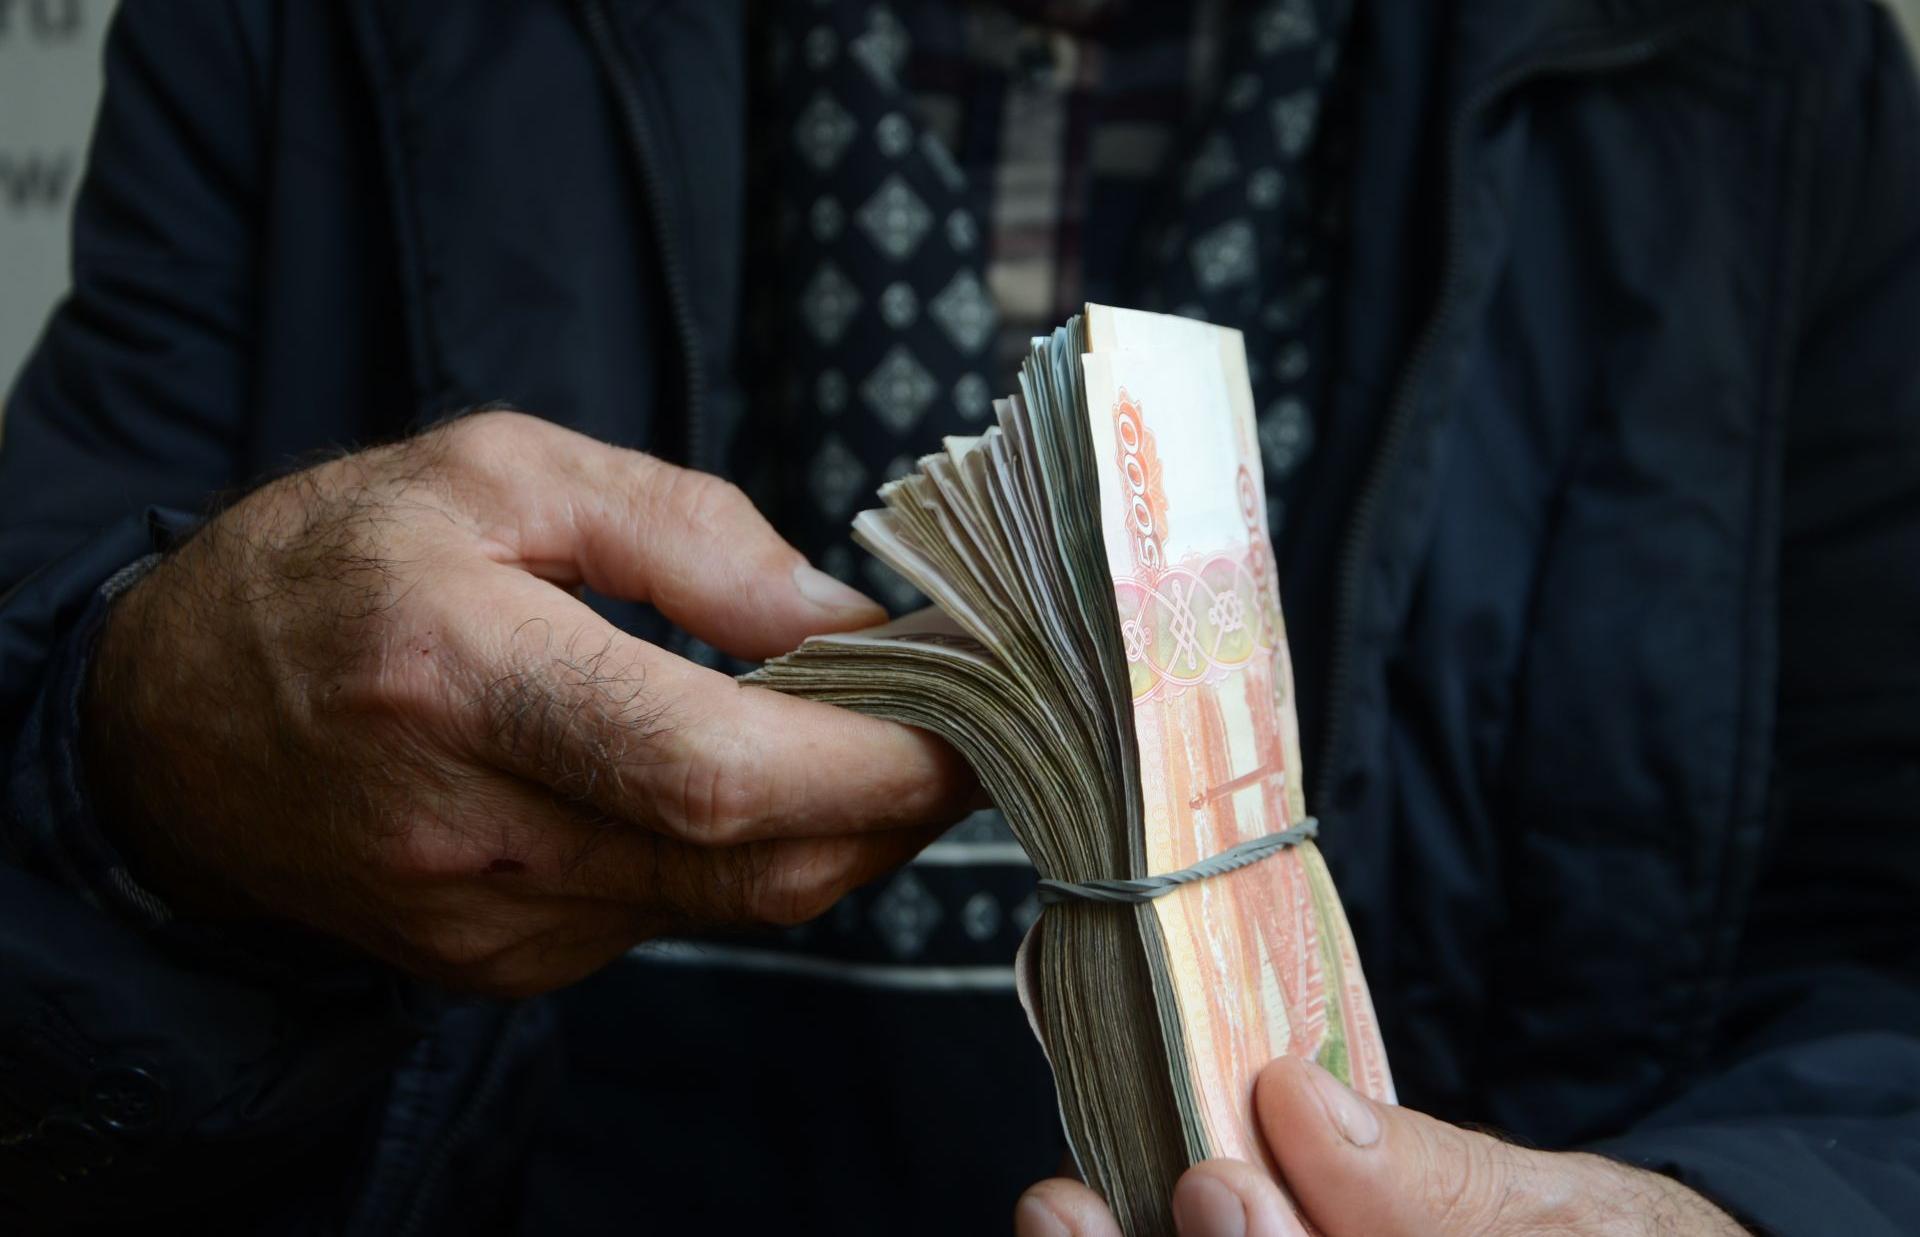 Пенсионеров обнадежили индексацией пенсий - новости Афанасий